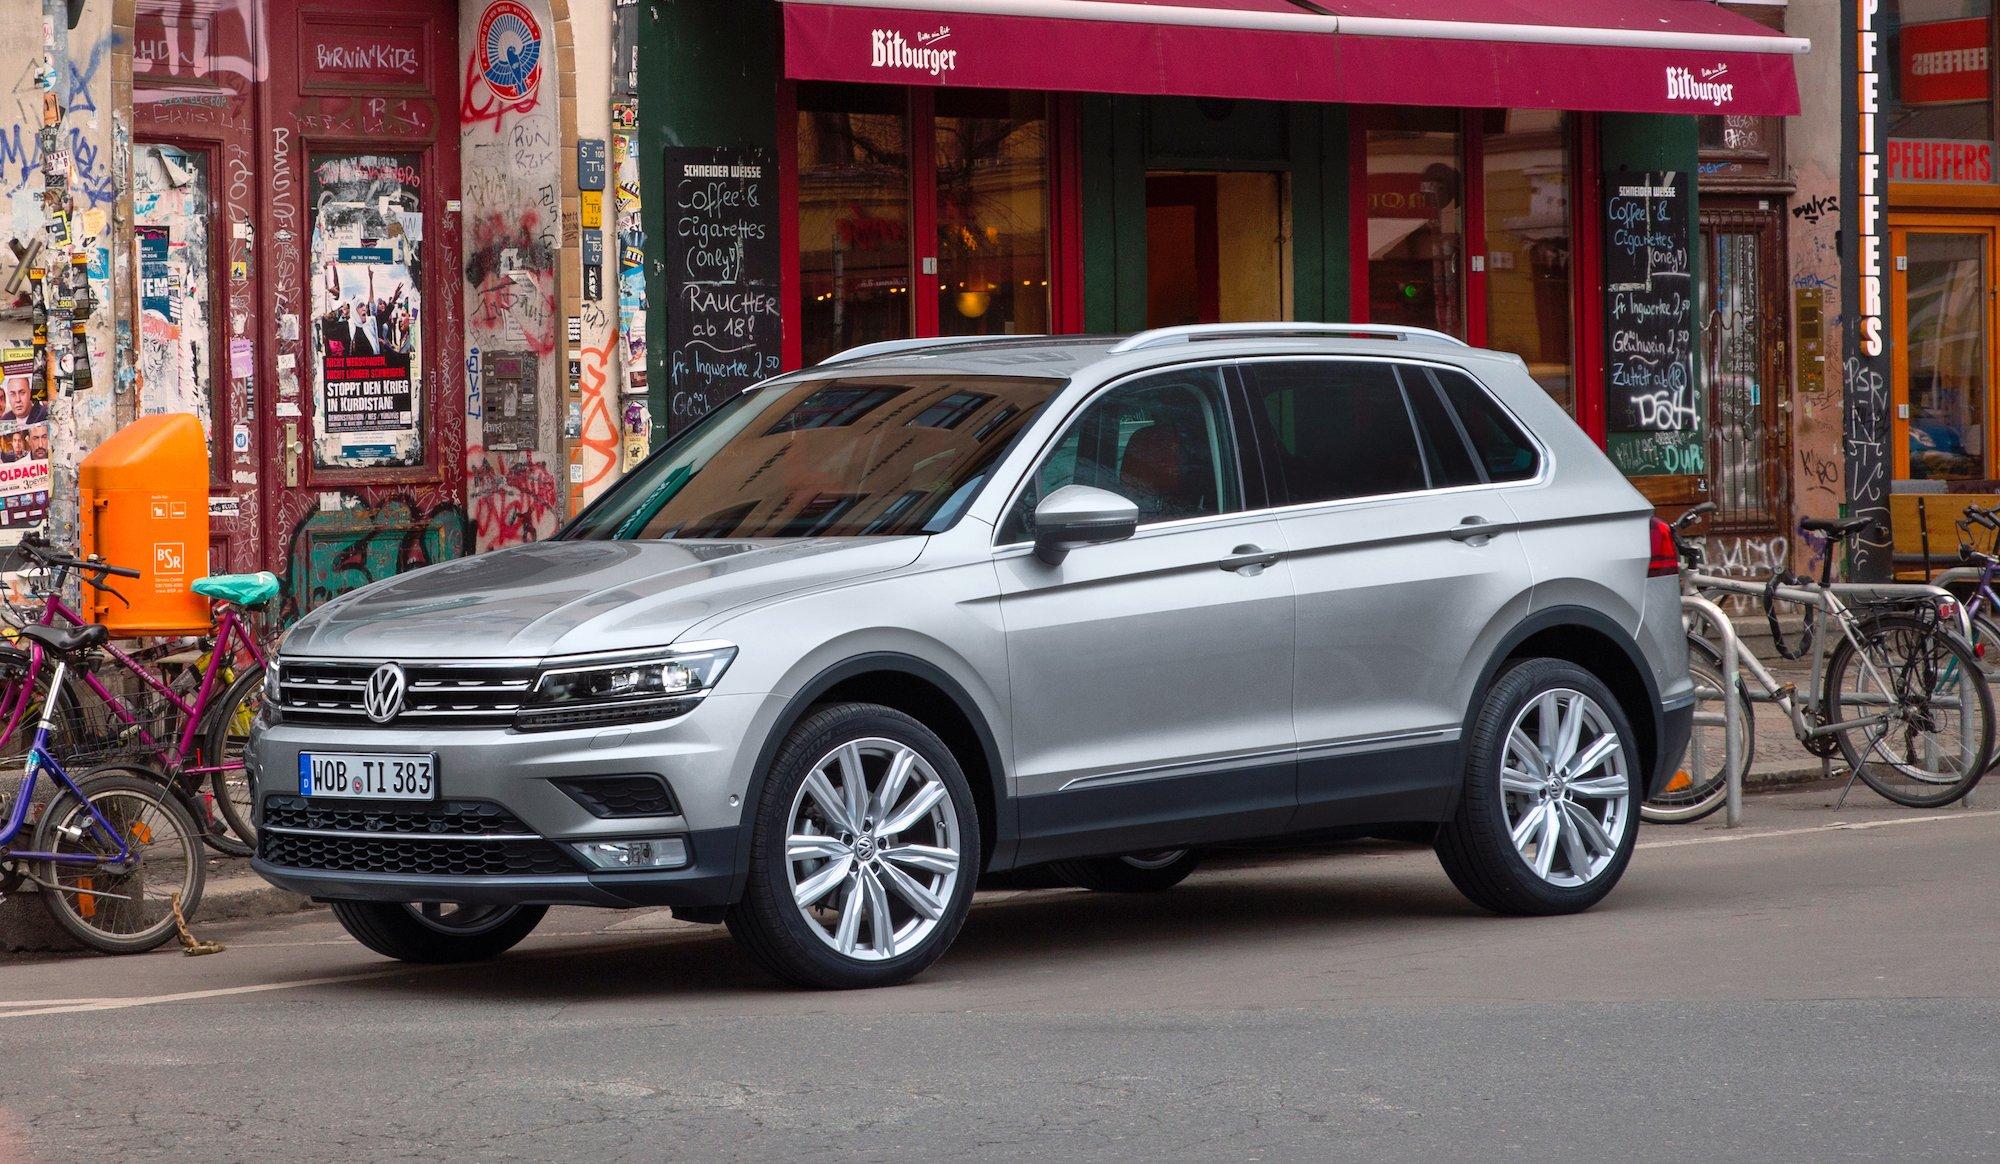 2016 Volkswagen Tiguan Review Photos Caradvice